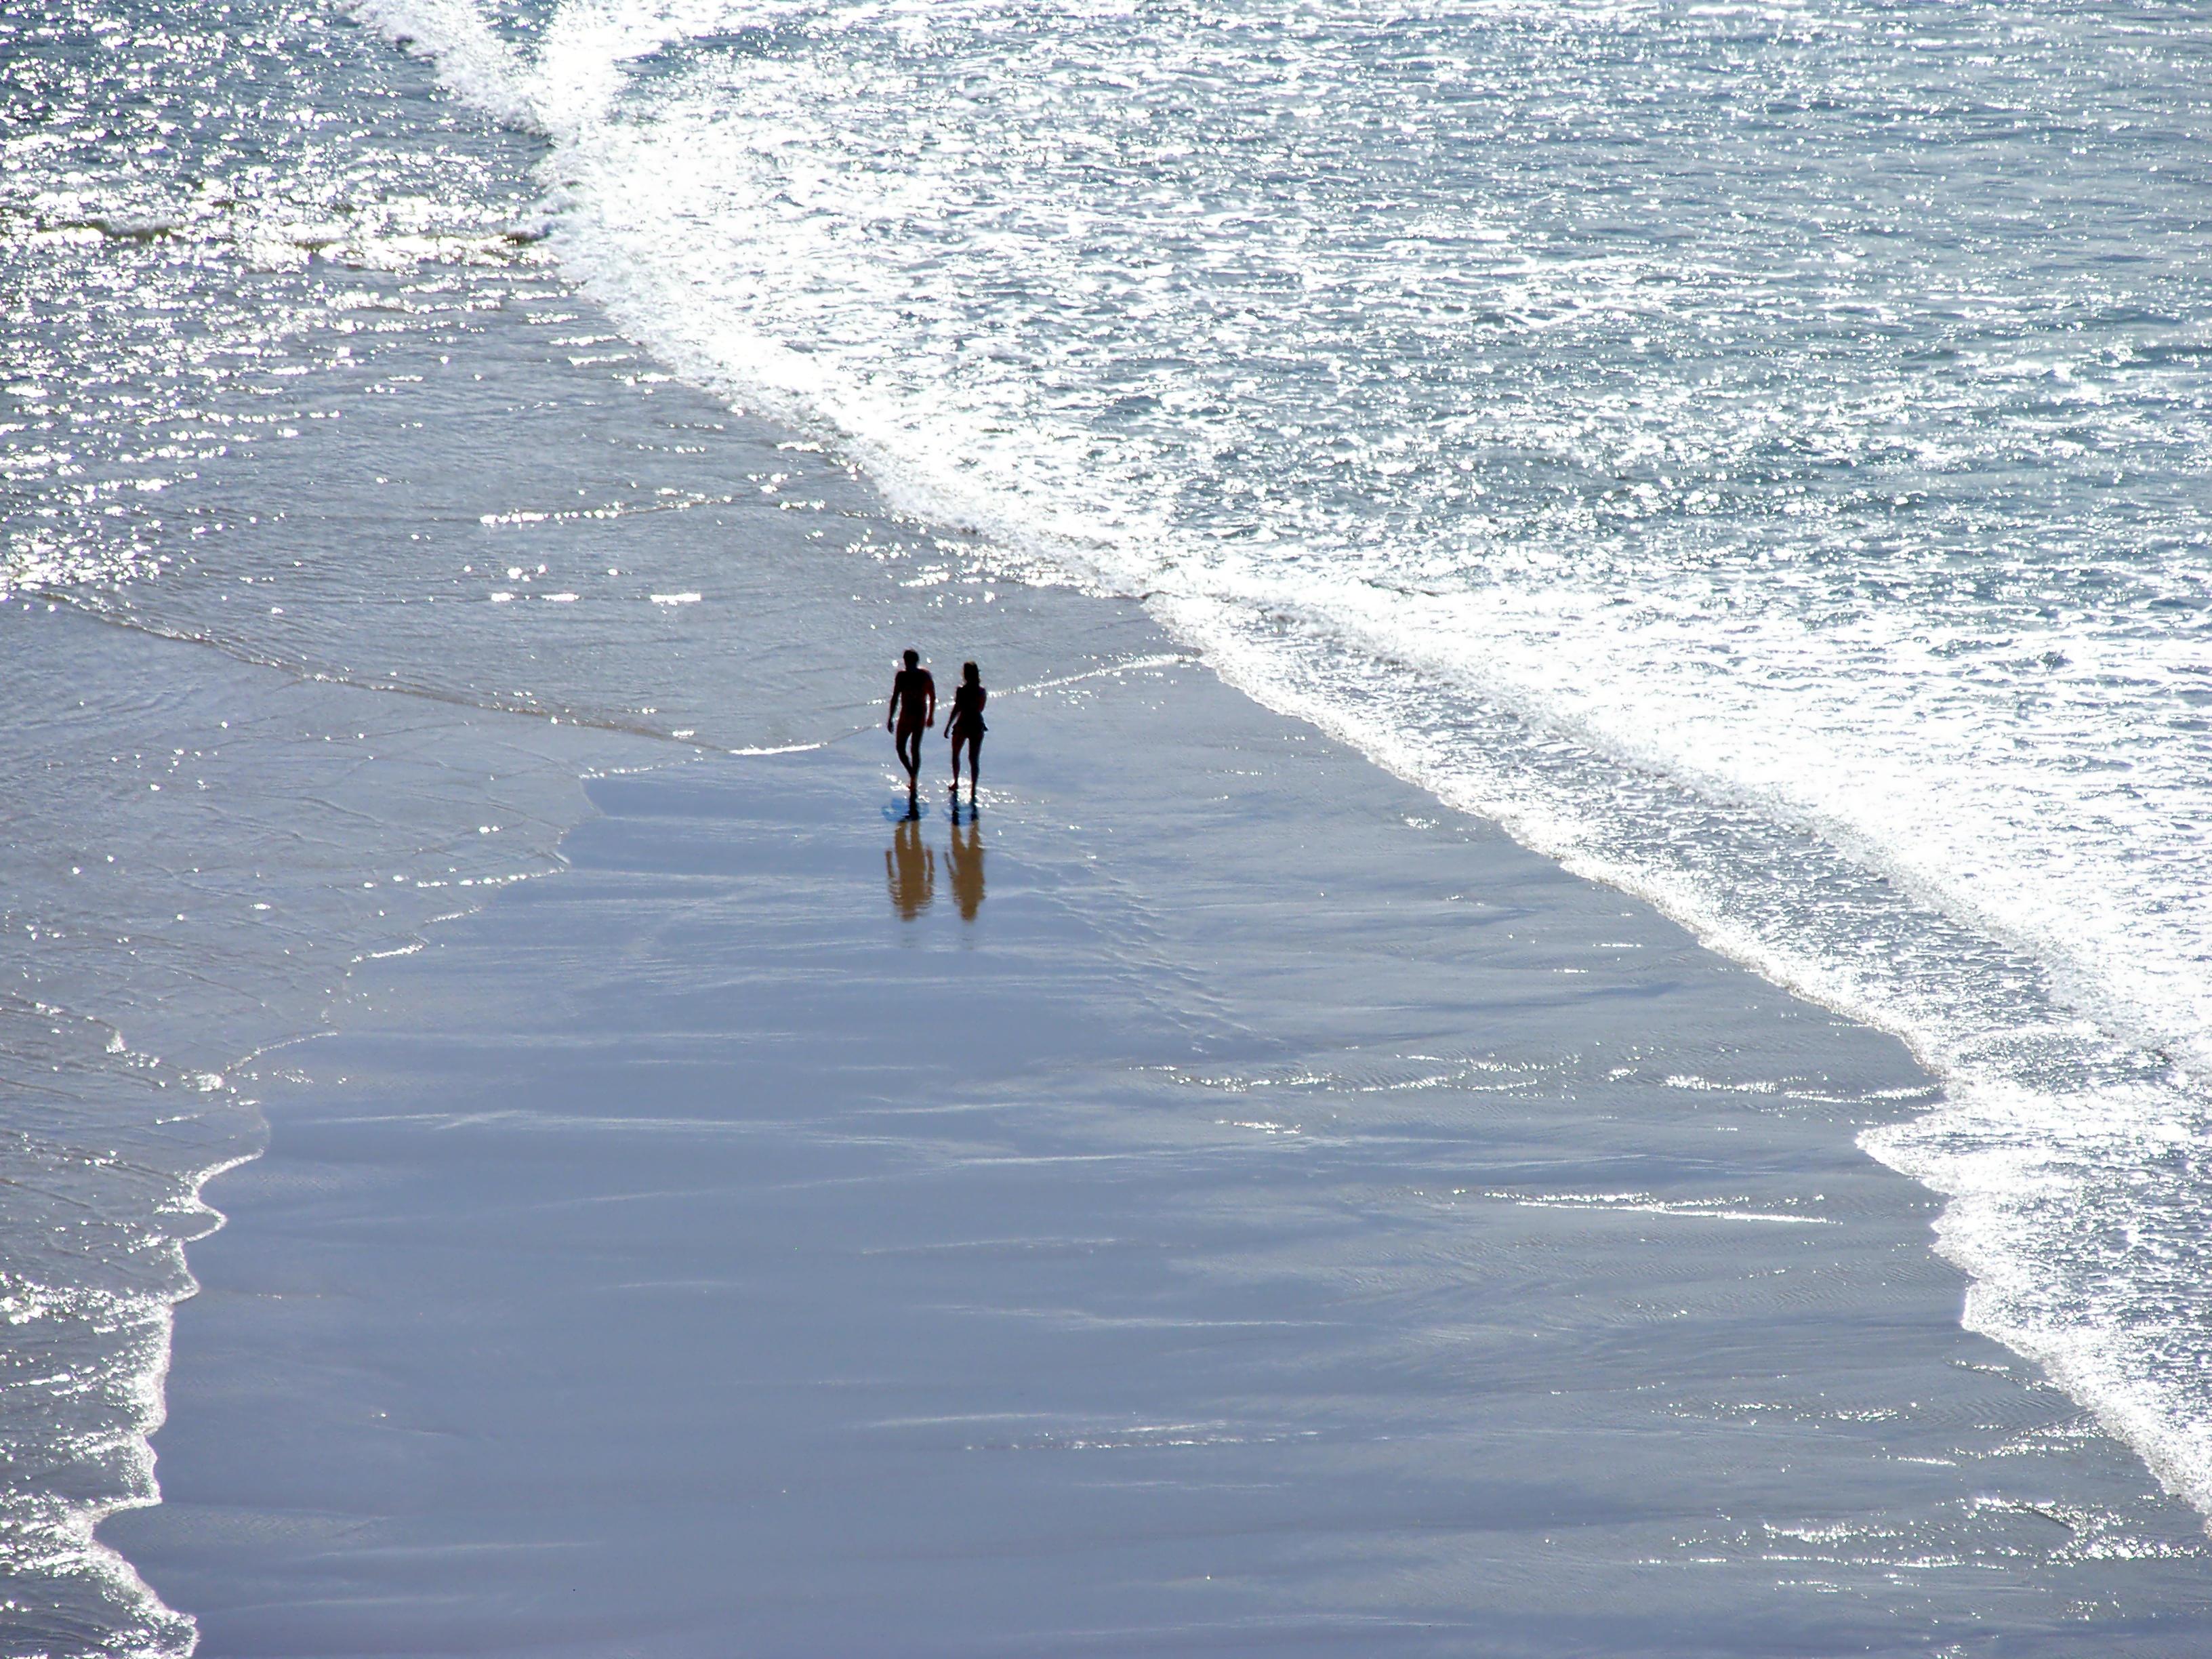 En la playa 37 - 1 9